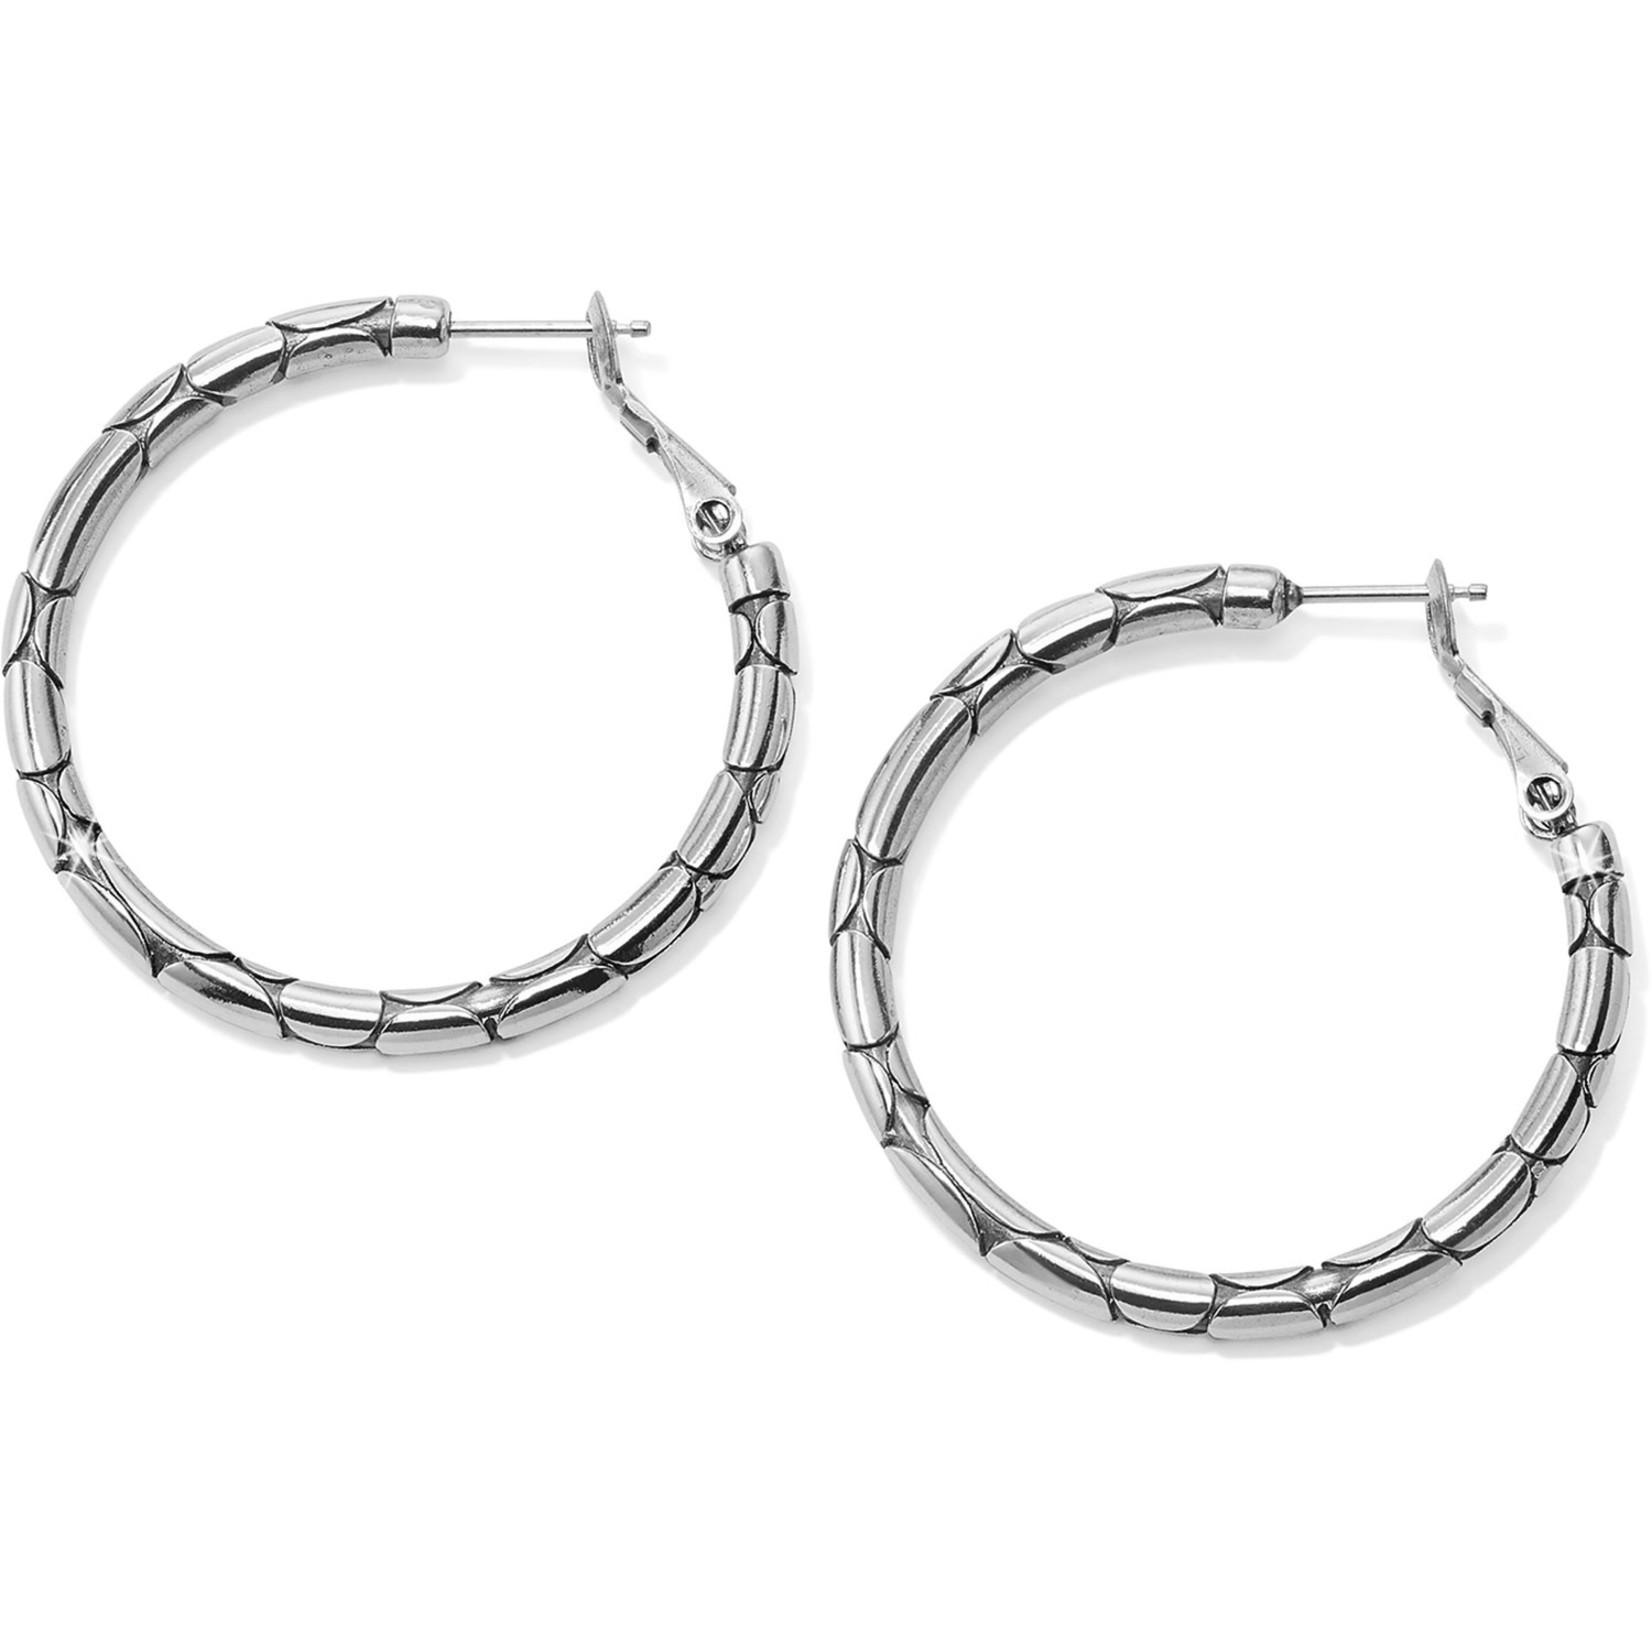 Brighton JA5420 Pebble Small Hoop Earrings